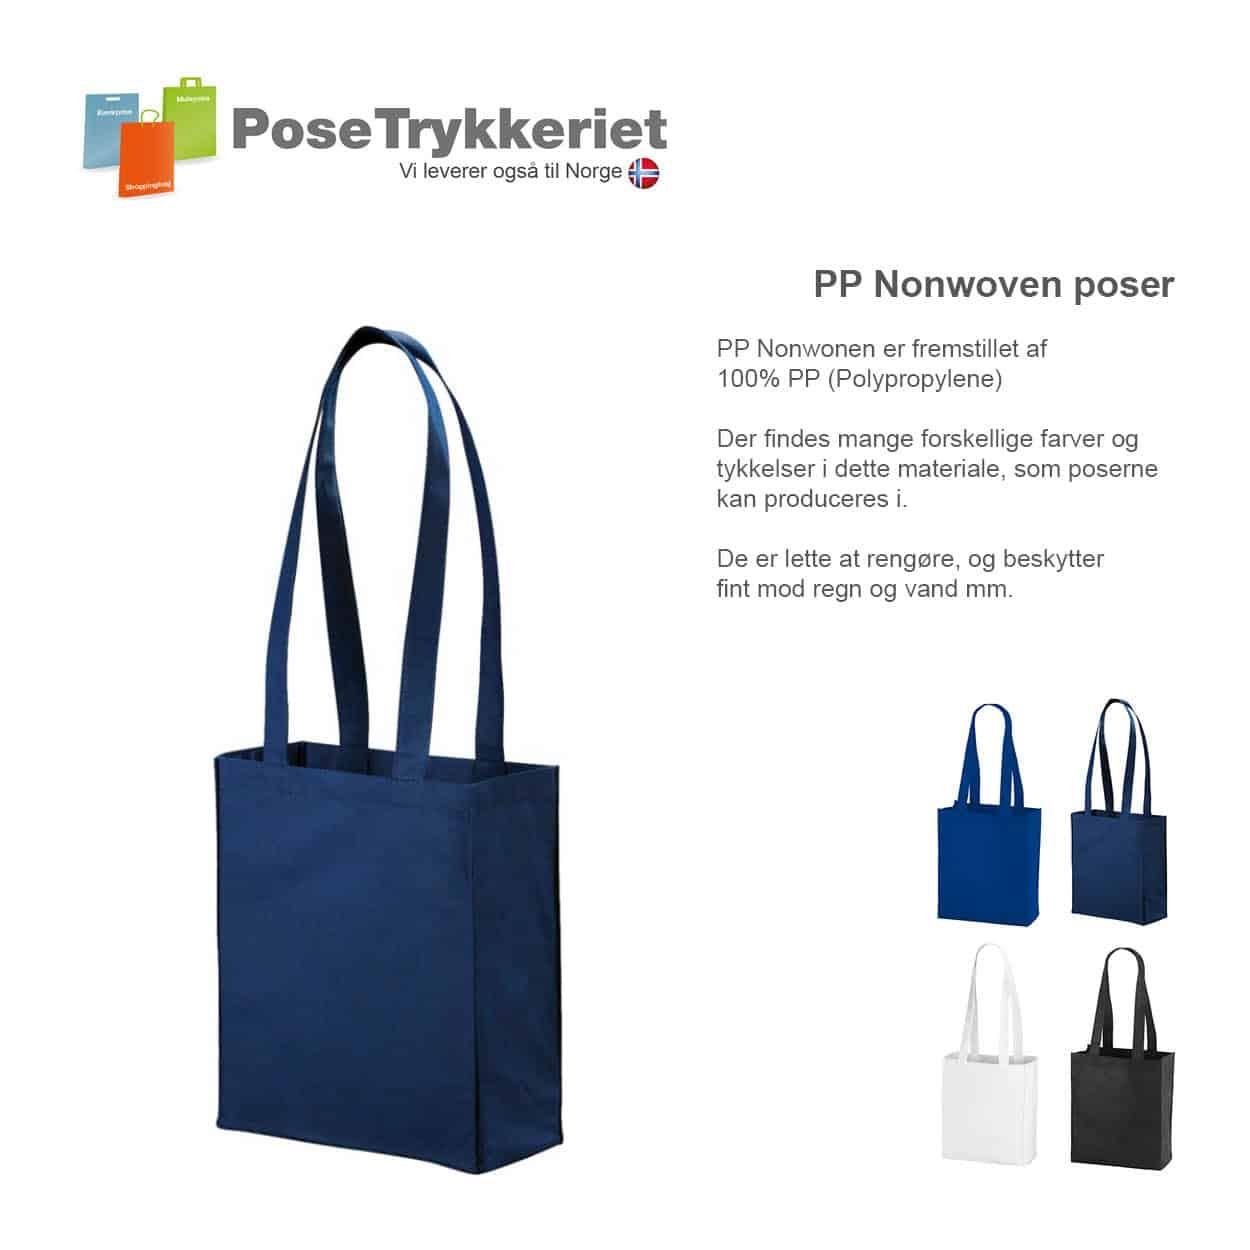 Nonwoven bæreposer med sider og bund og med logotryk. PoseTrykkeriet.dk